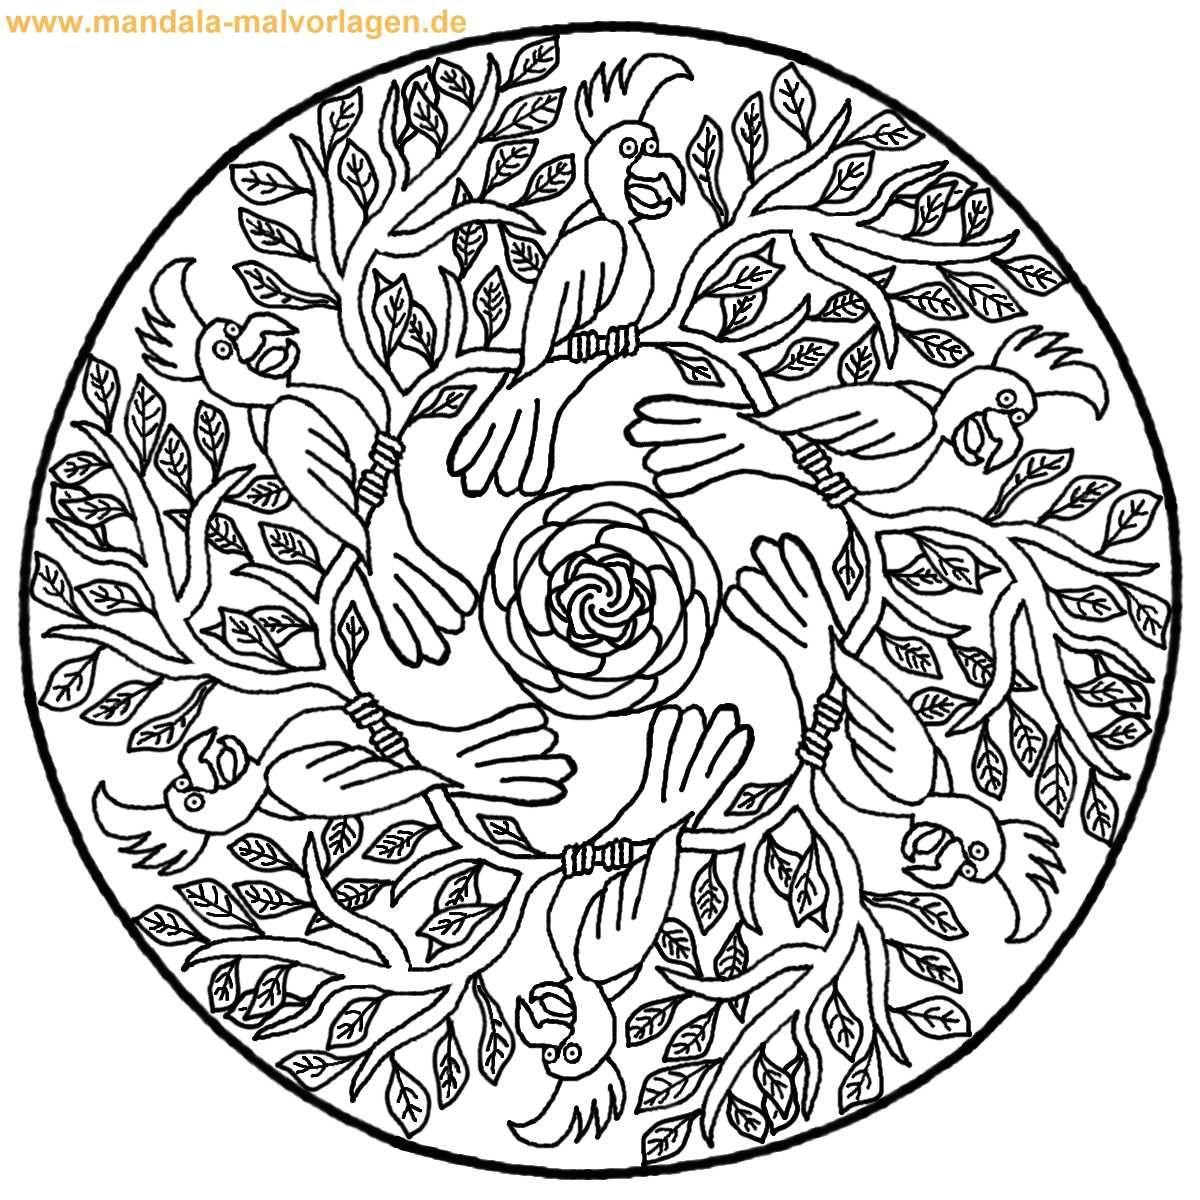 Tiere Papagei Malvorlage Mandala fuer Kinder 1200—1200